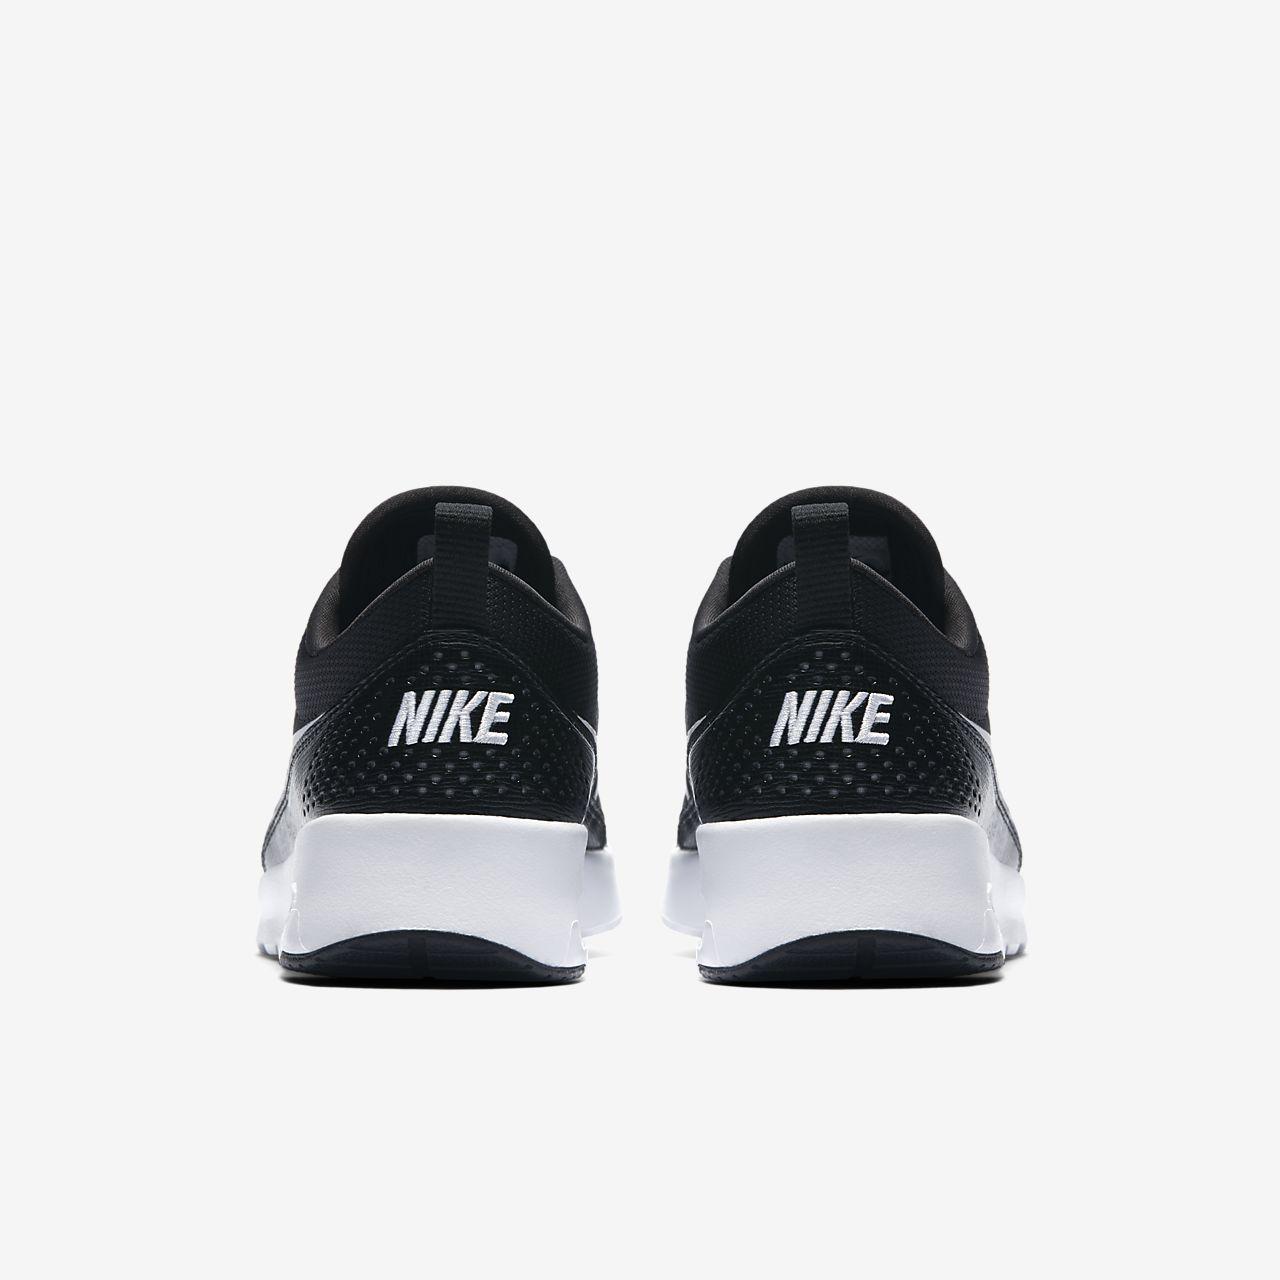 fbad93a244c5 Nike Air Max Thea Women s Shoe. Nike.com GB